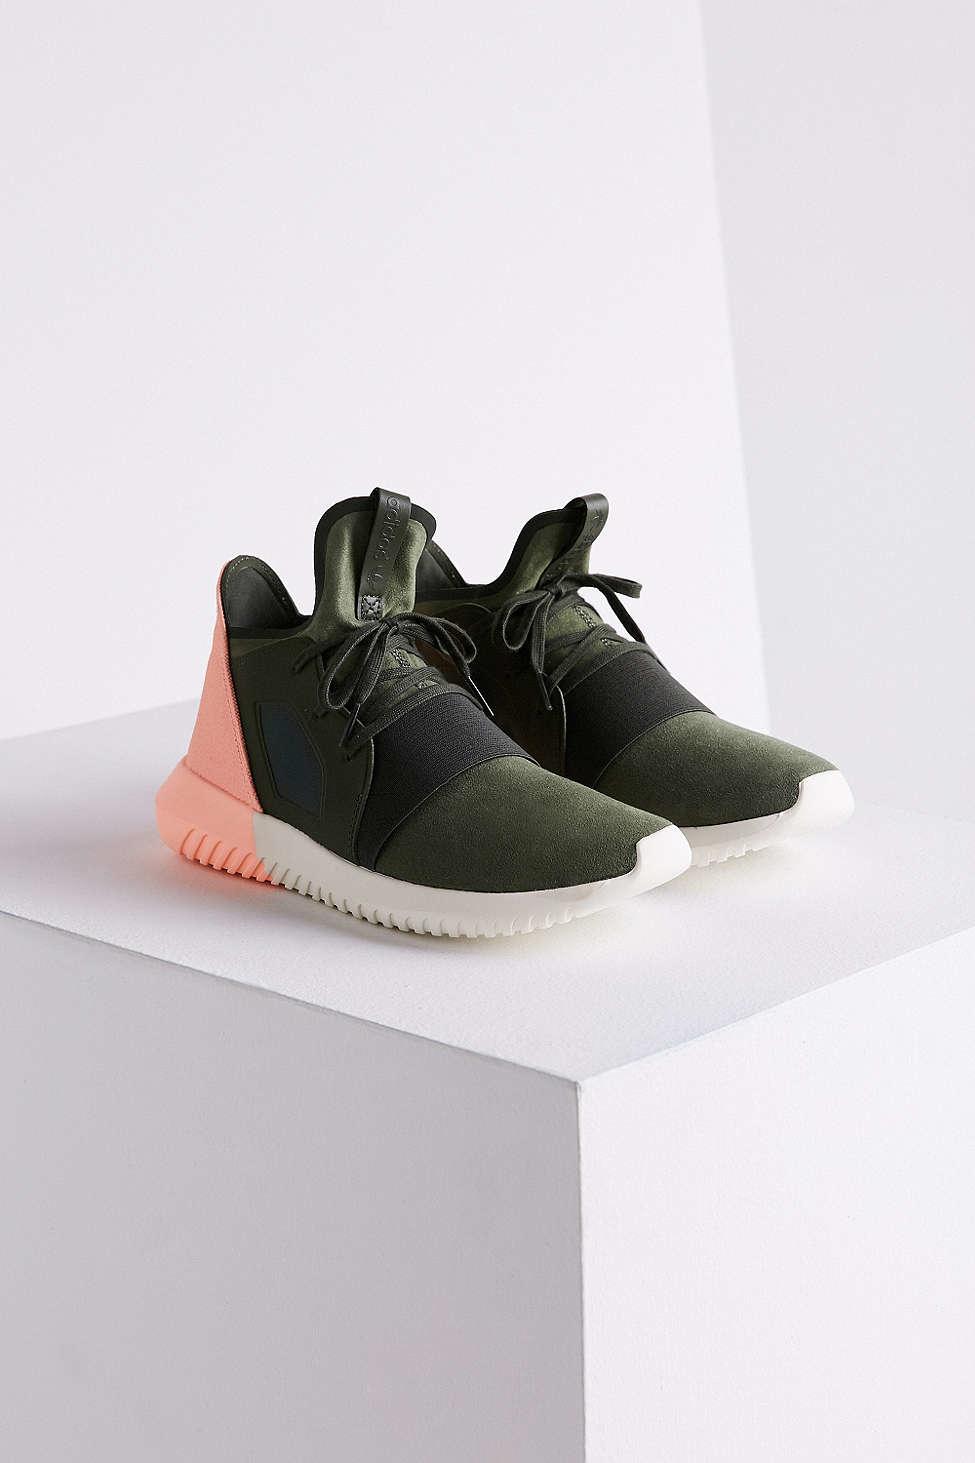 Adidas Tubular Defiant Green